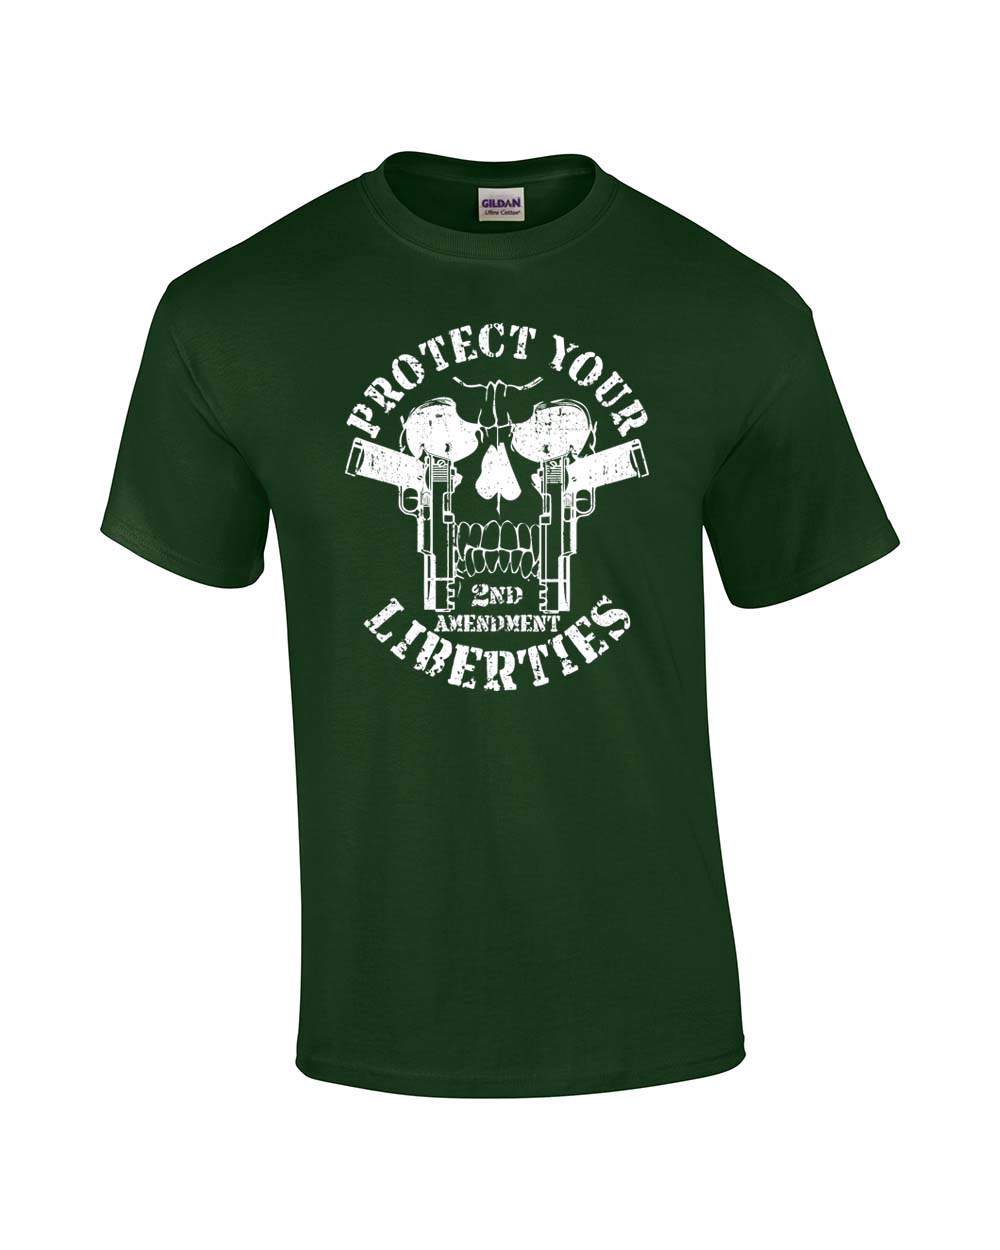 2nd Amendment T-Shirt Protect Your Liberties